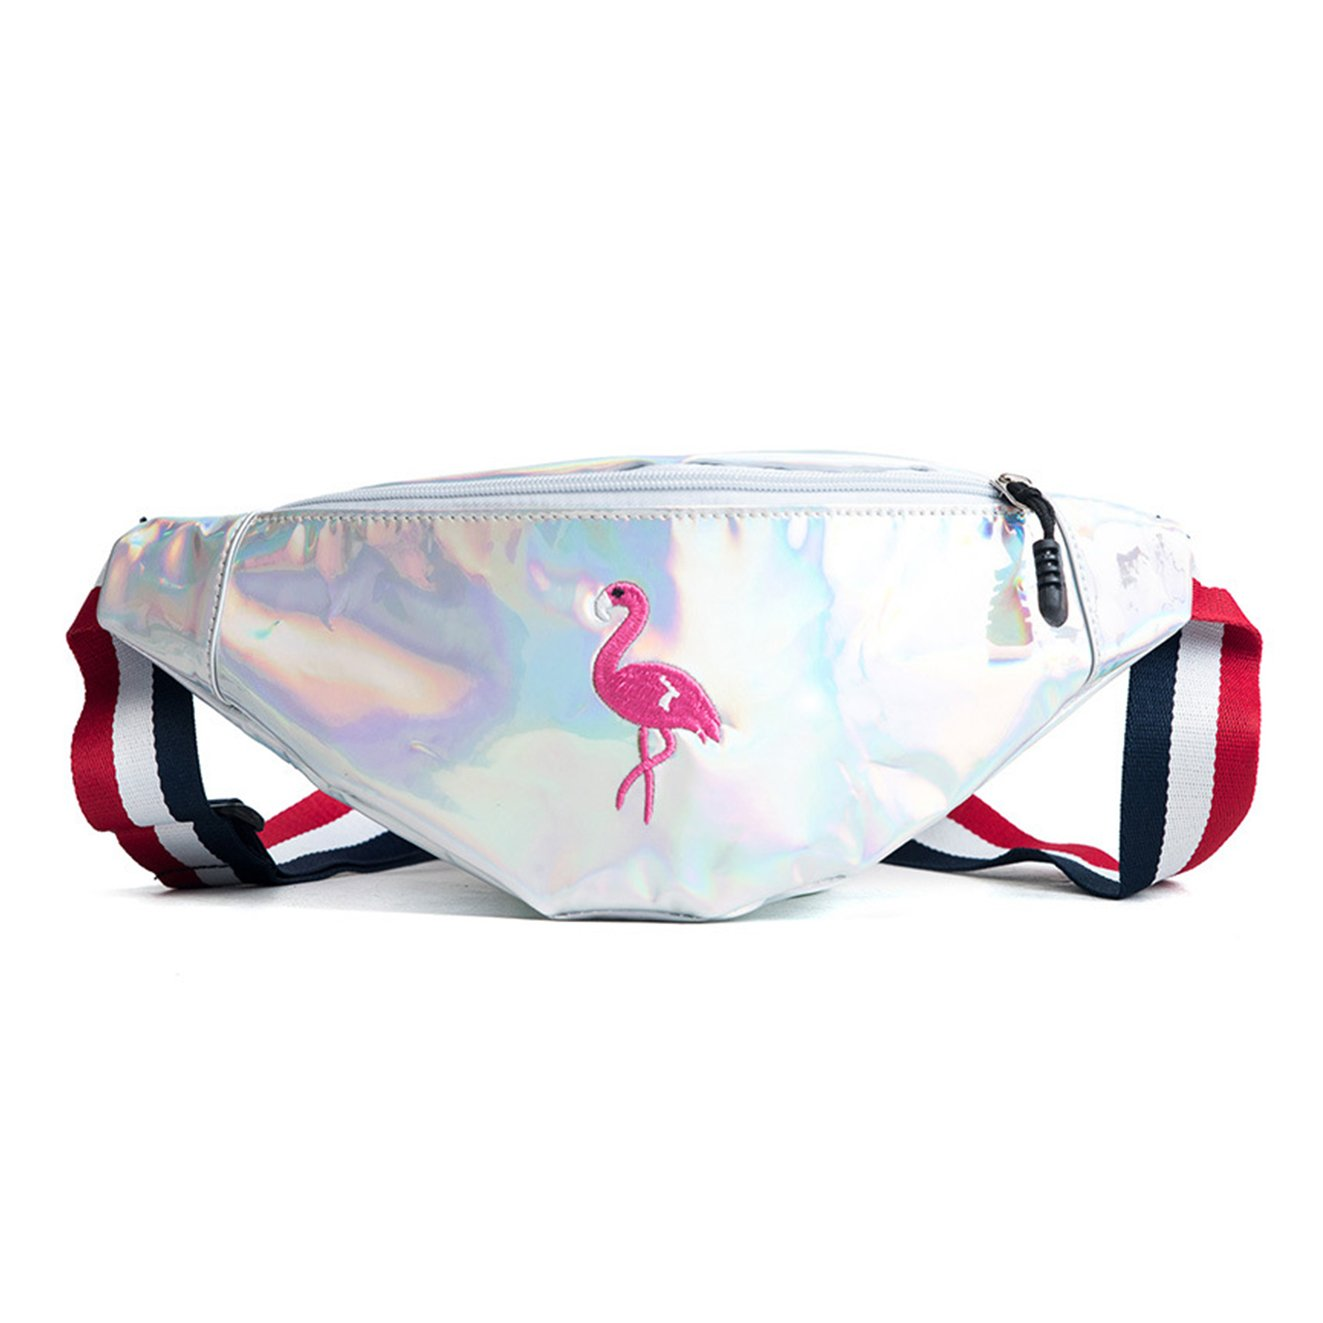 SEEU Fanny Pack Waist Bag for Girl, Shinny Hip Bum Bag for Outdoor Travel, Flamingo Pattern, PU